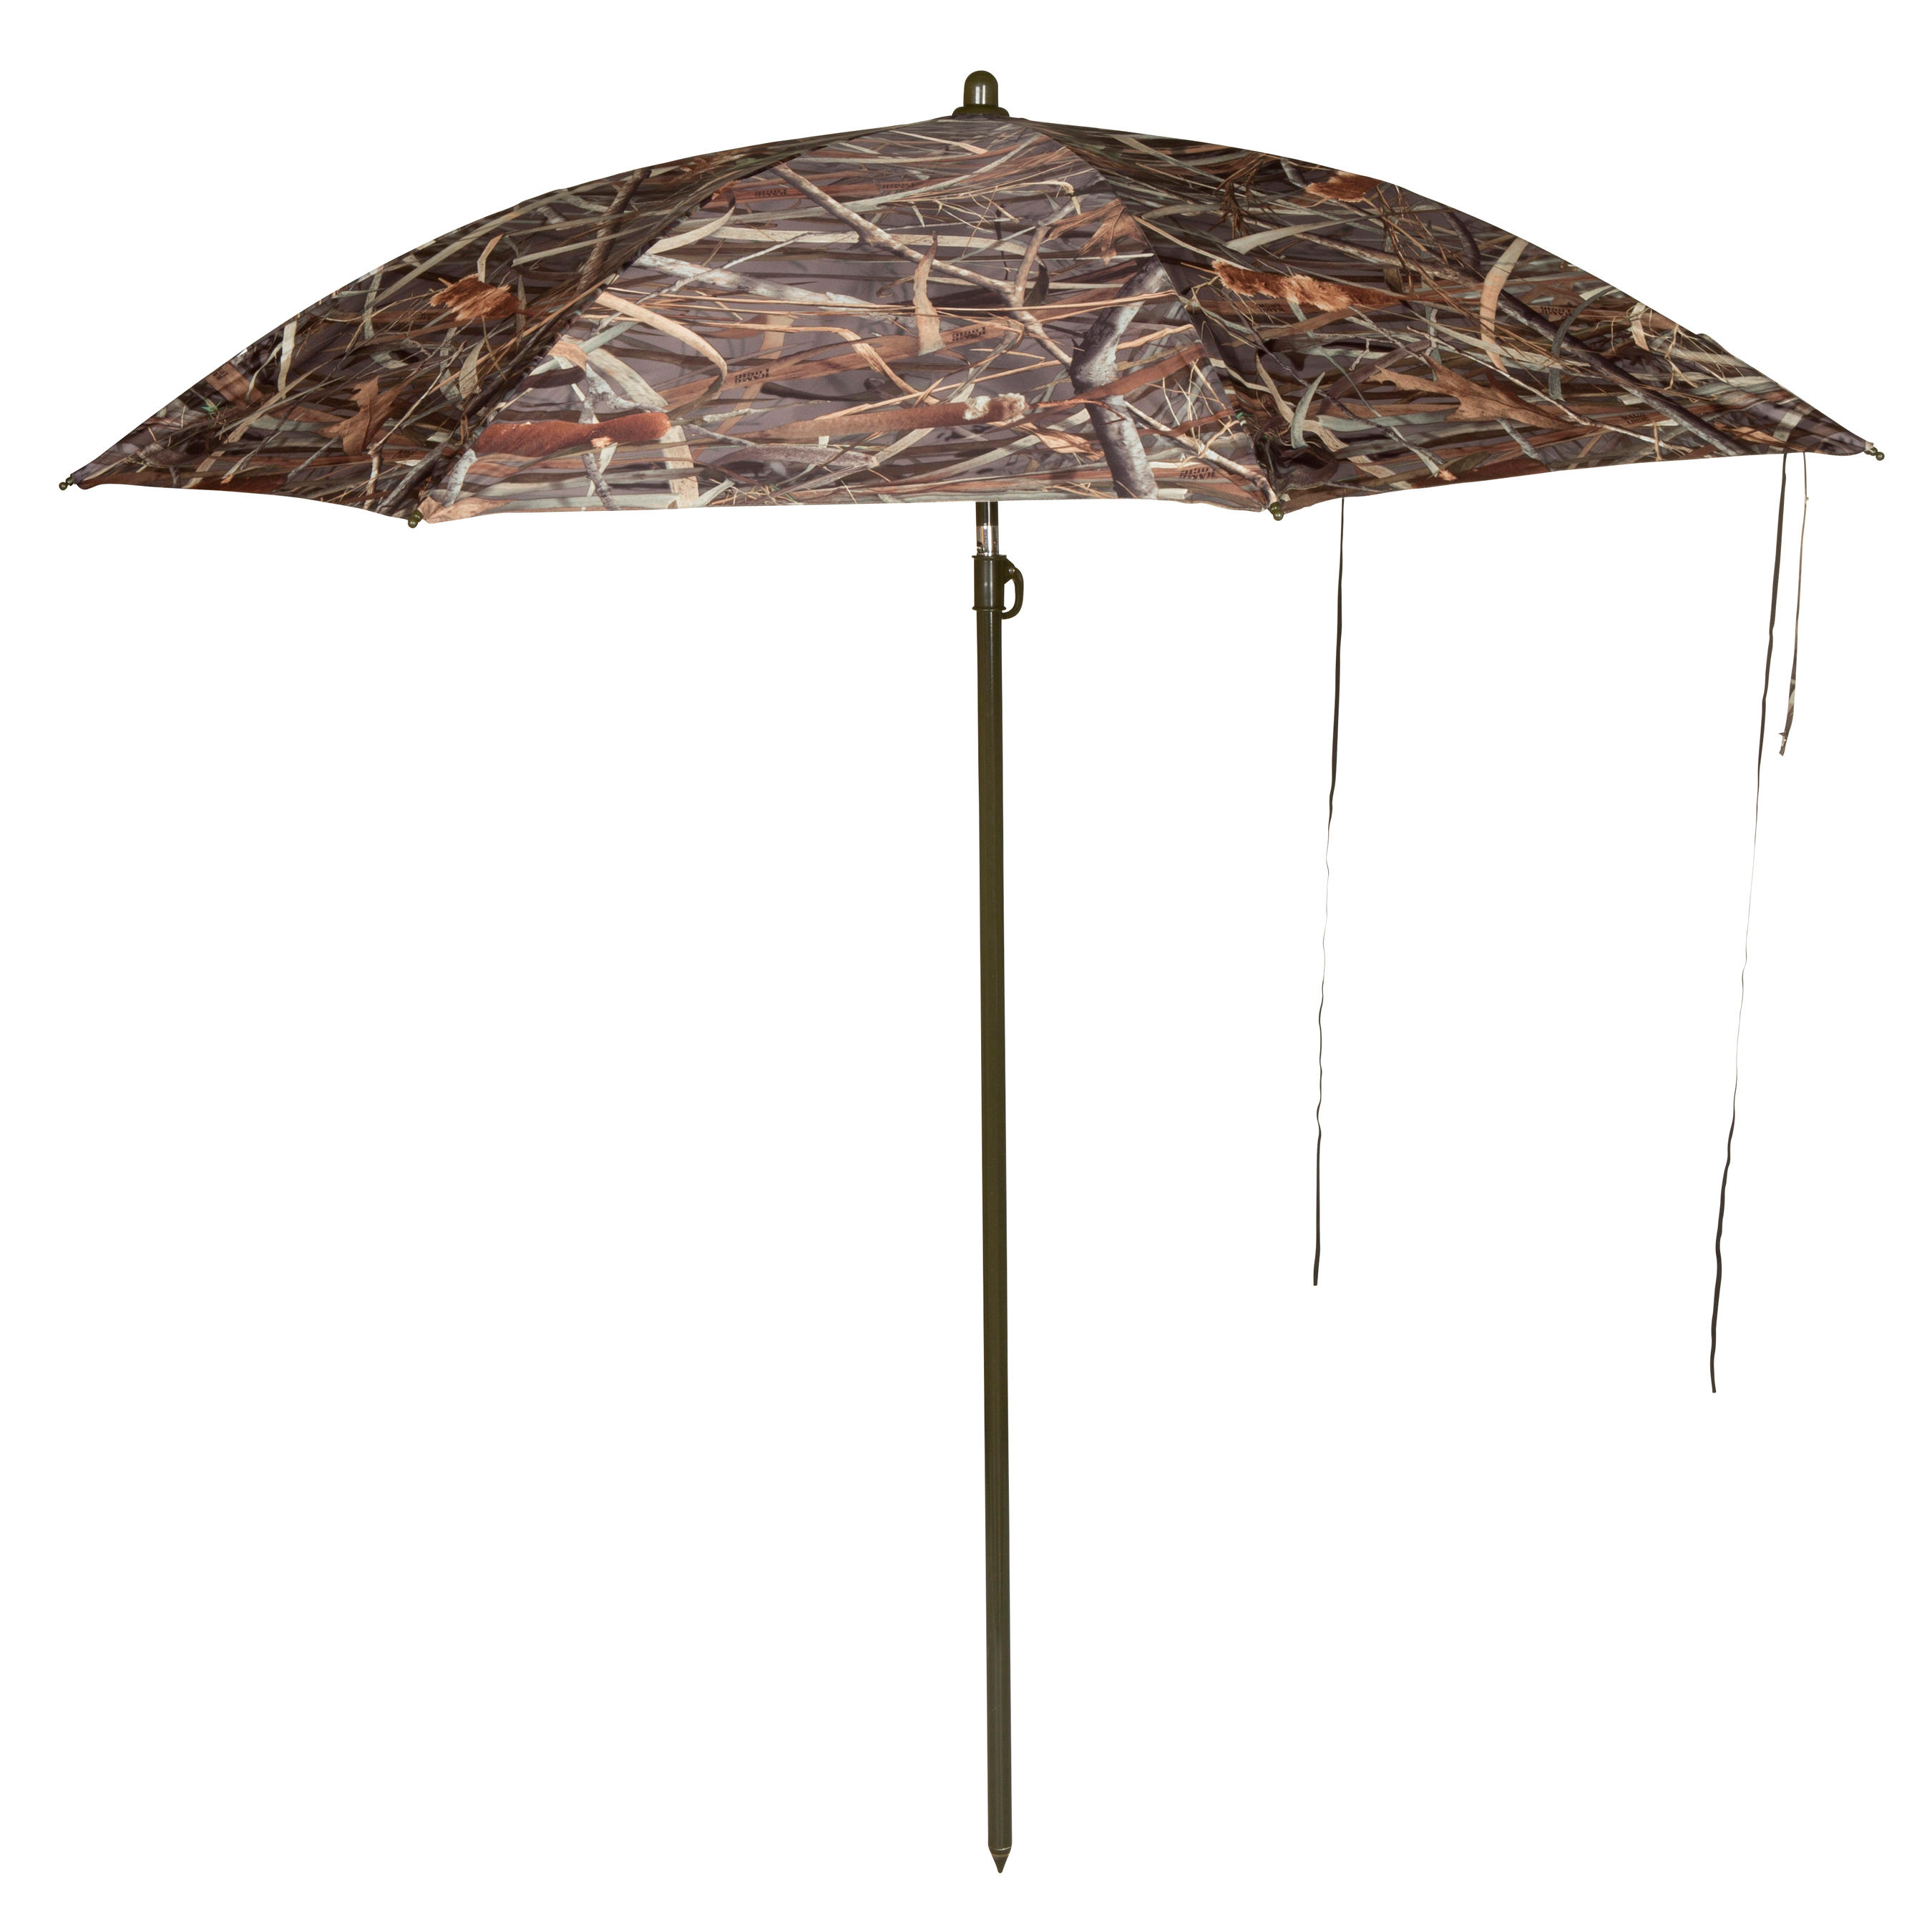 Wetlands camouflage hunting umbrella